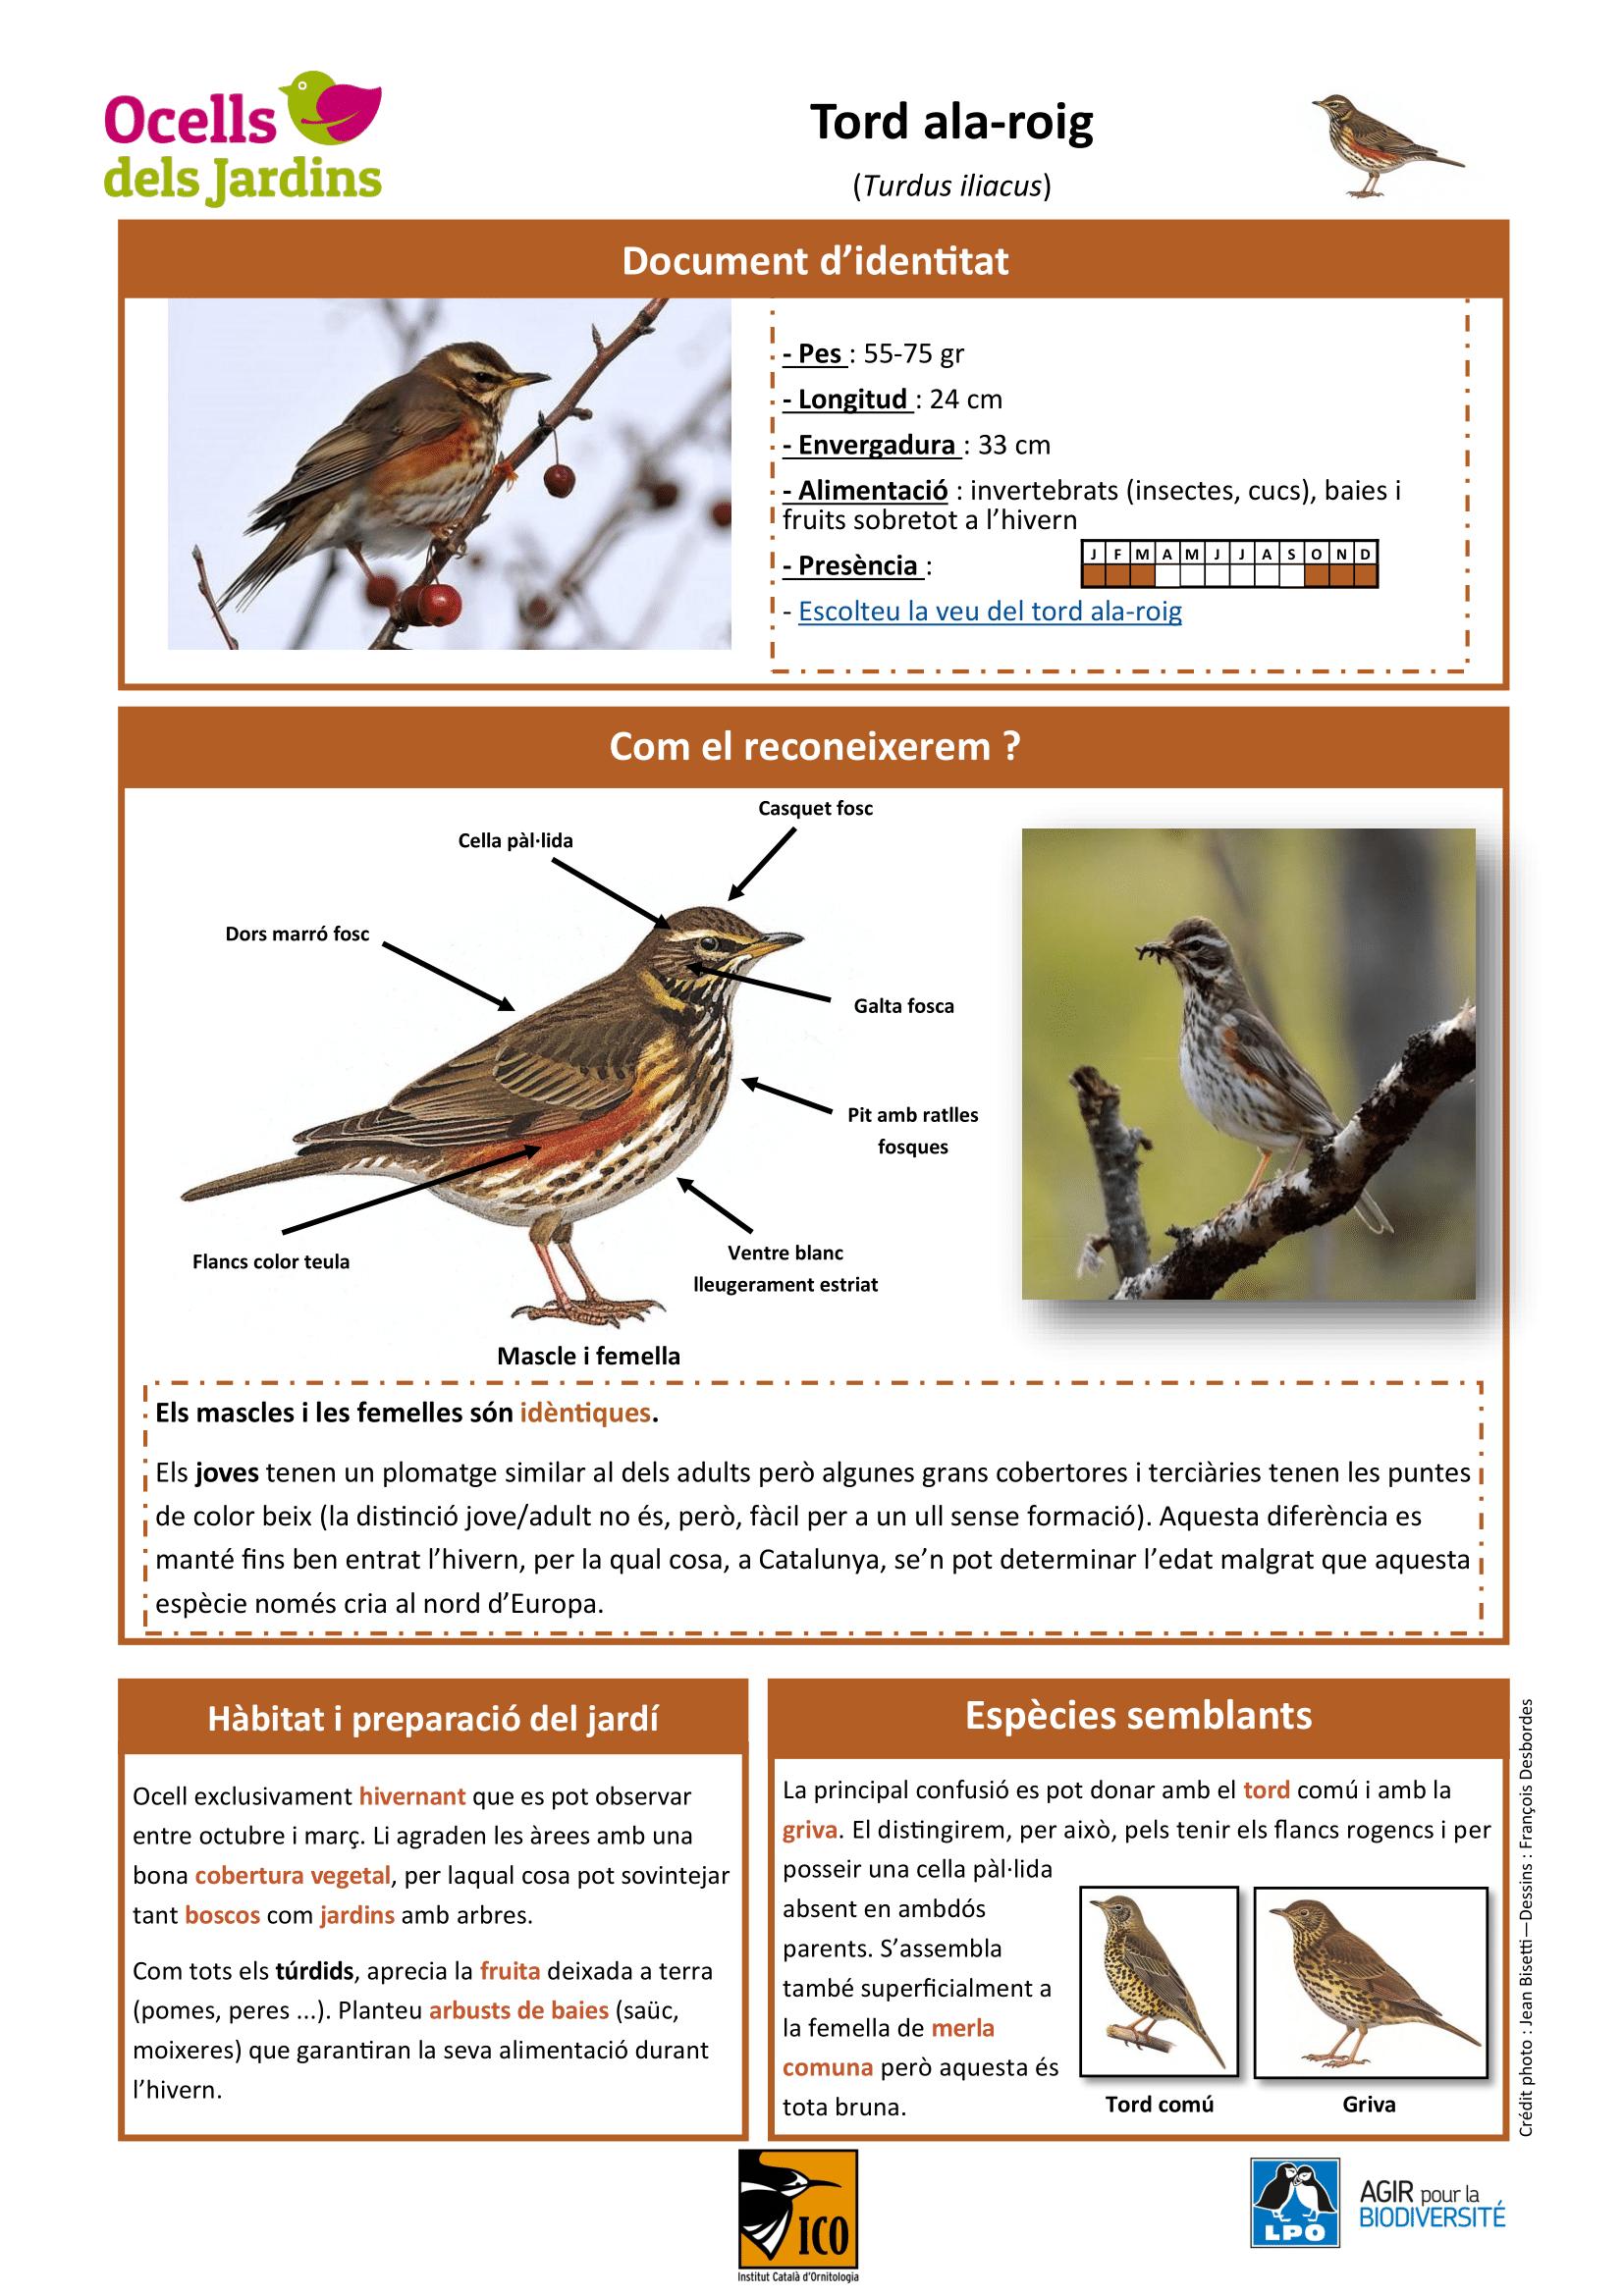 https://cdnfiles1.biolovision.net/www.ocellsdelsjardins.cat/userfiles/tordala-roig1-1.png